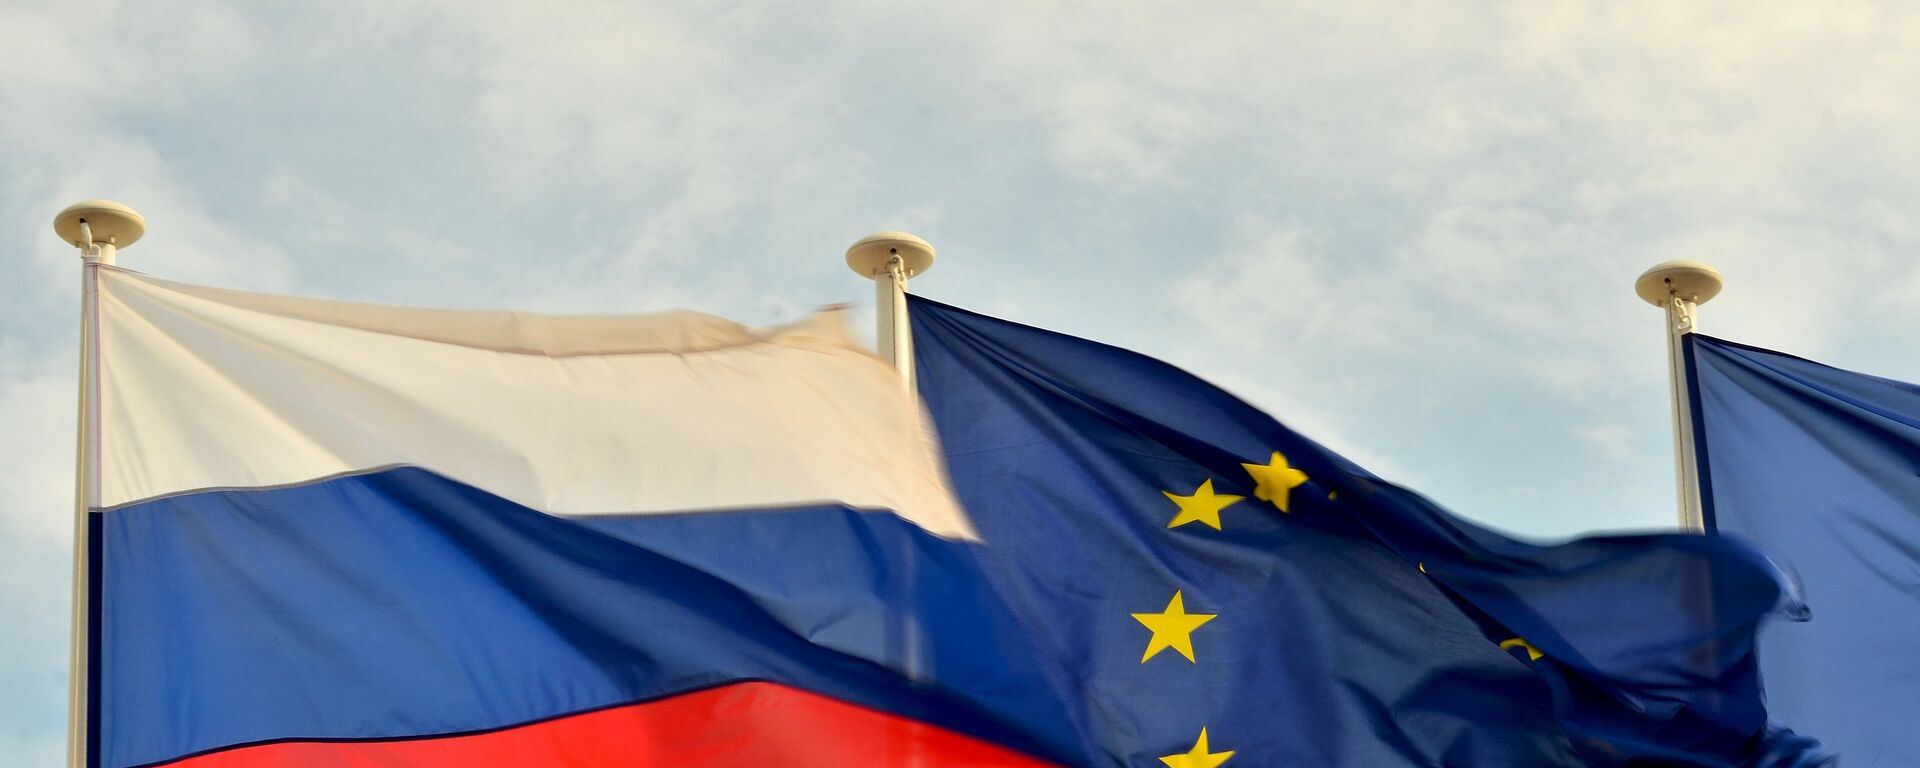 Flaga Rosji i UE - Sputnik Polska, 1920, 03.05.2021